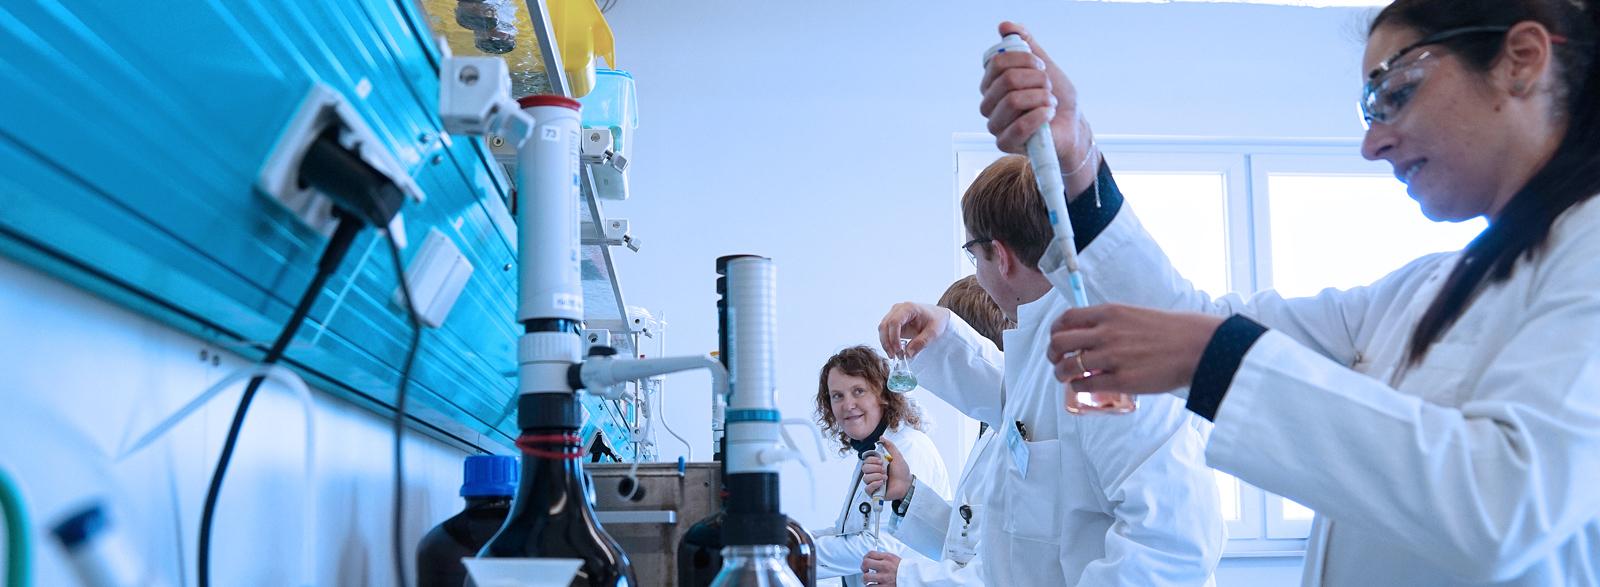 Career at DSI-pharm - Laboratory for Pharmaceutical Analysis